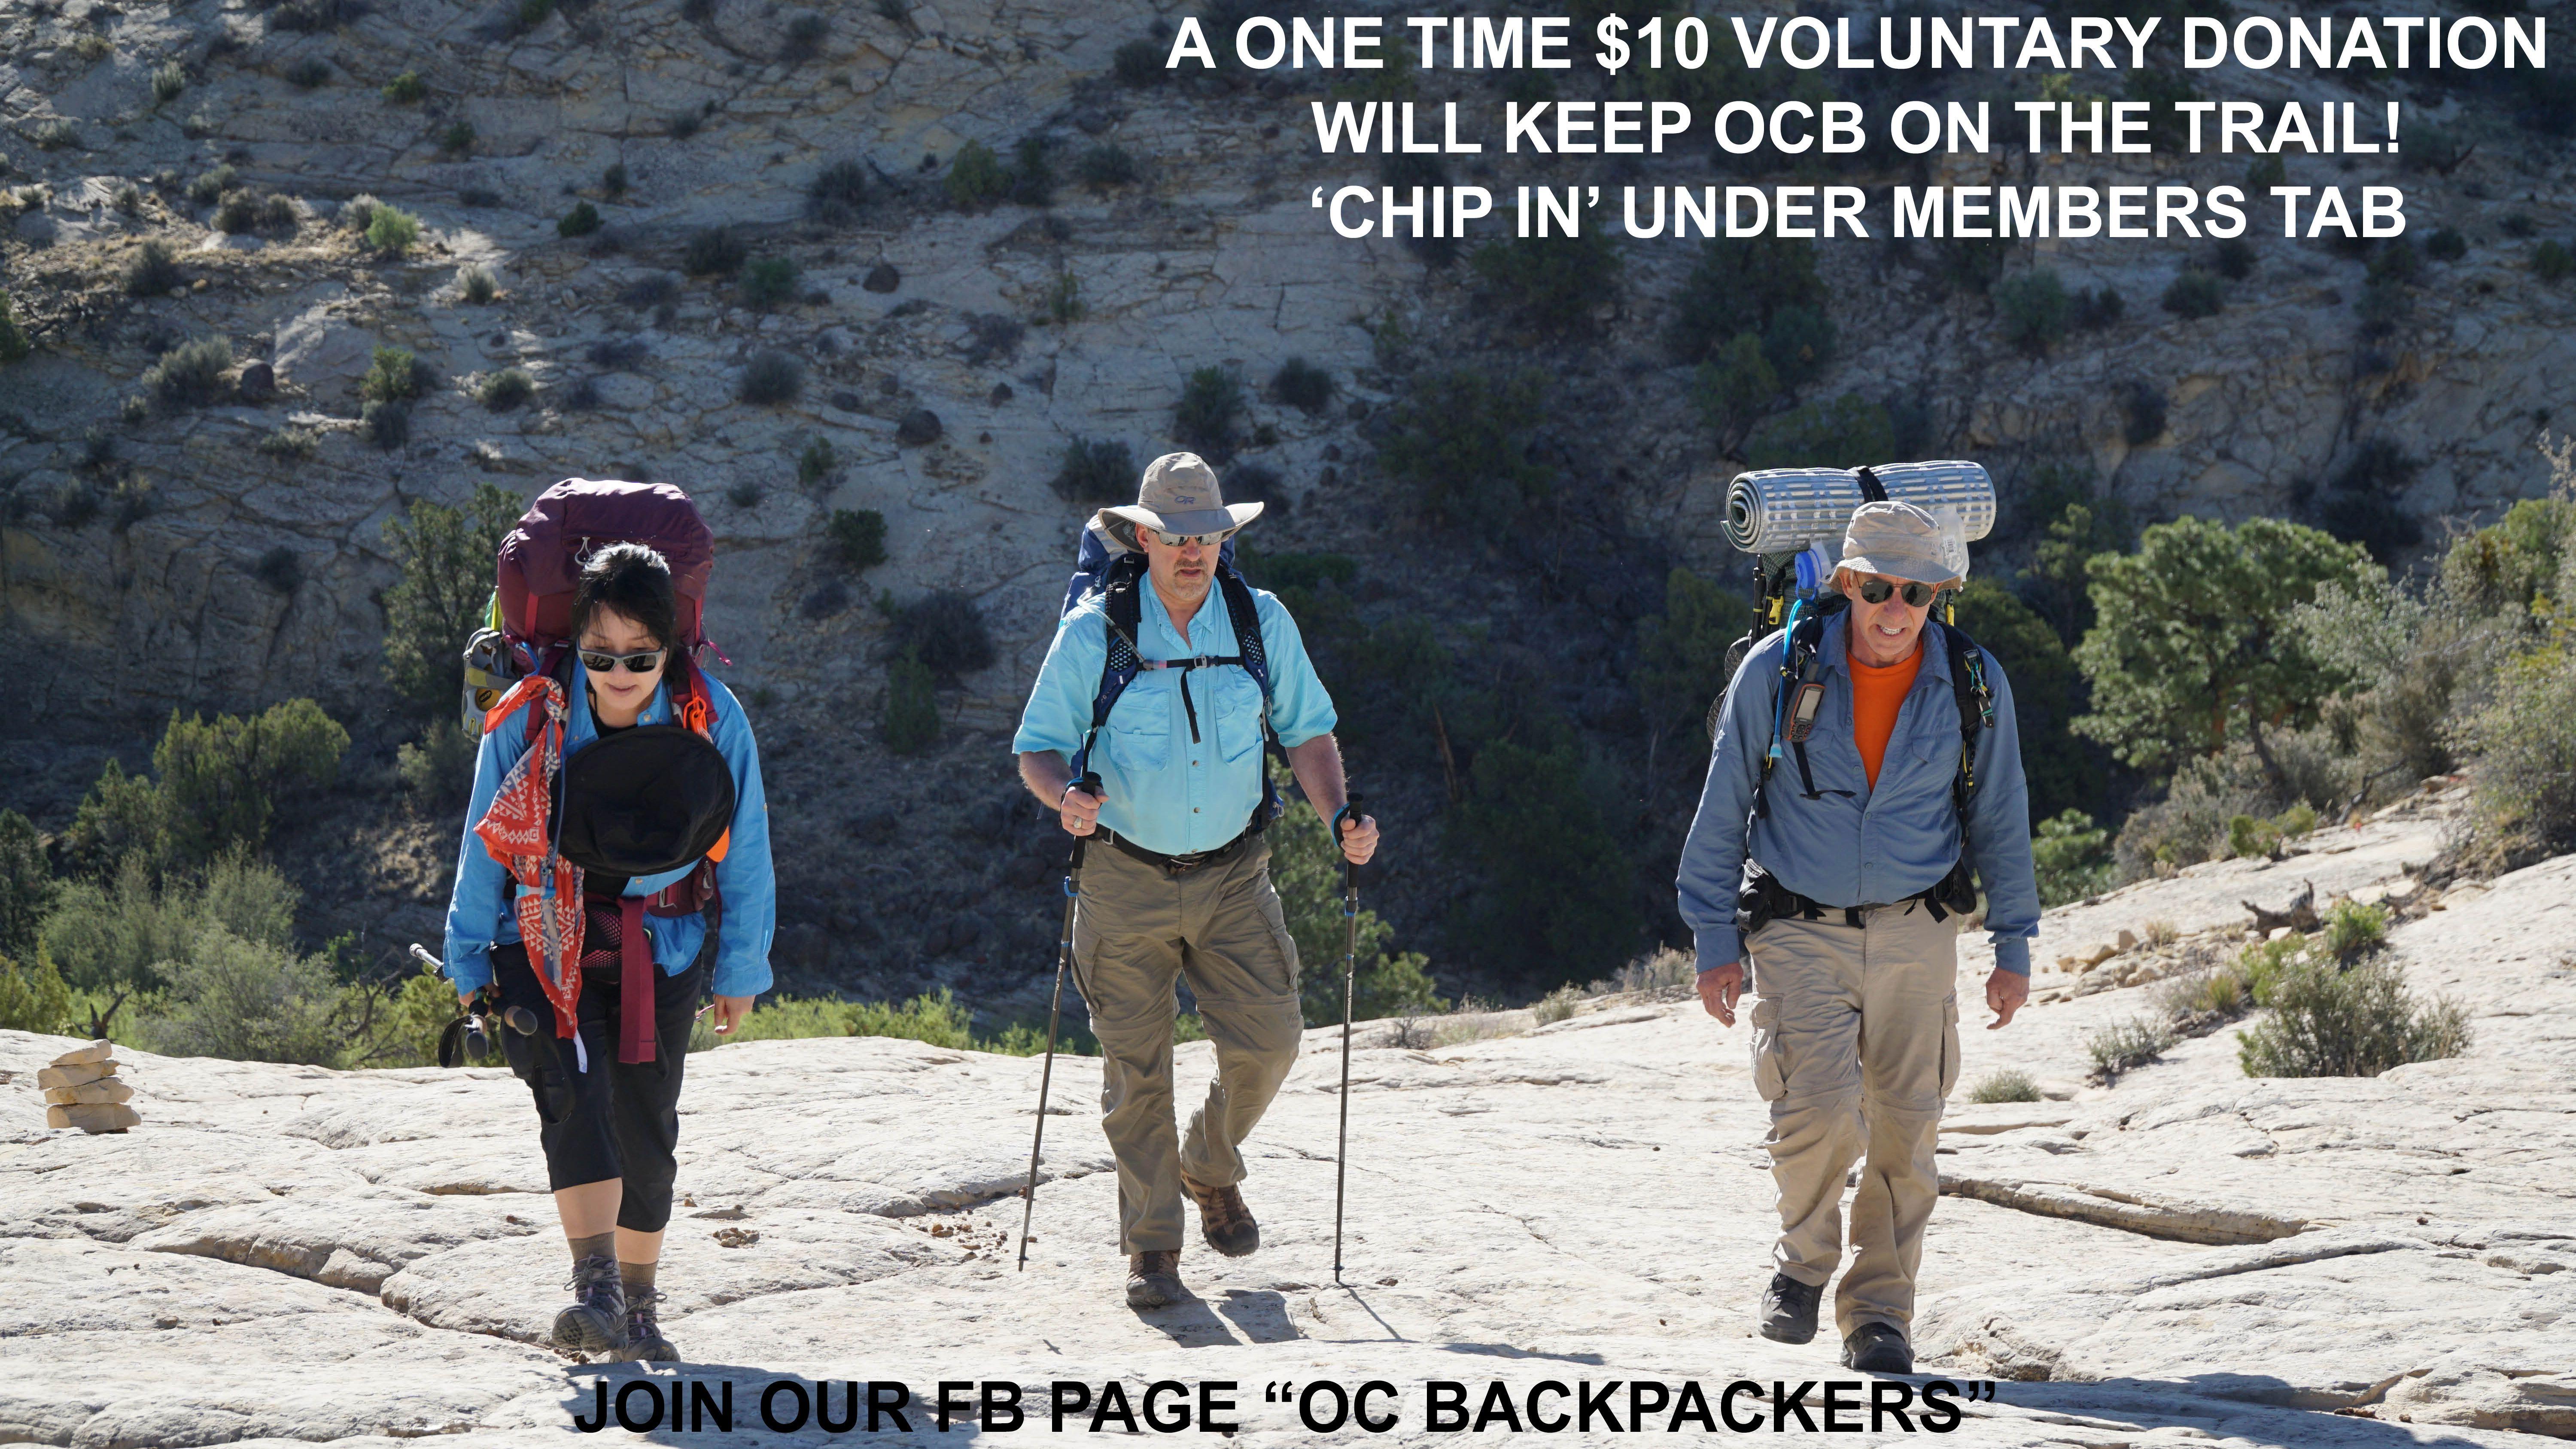 OC Backpackers